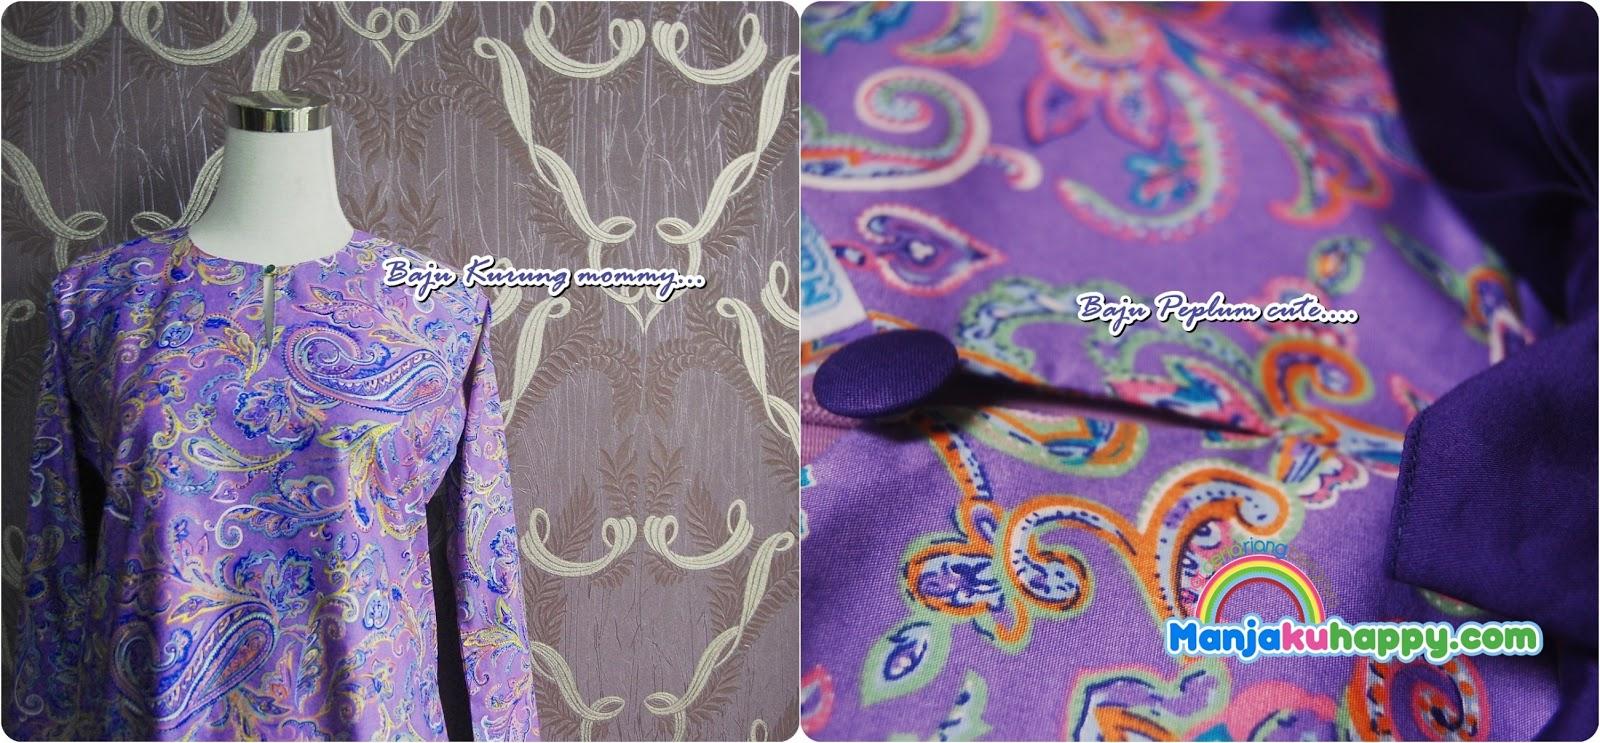 Baju Sedondon Ibu dan anak -purple paisley